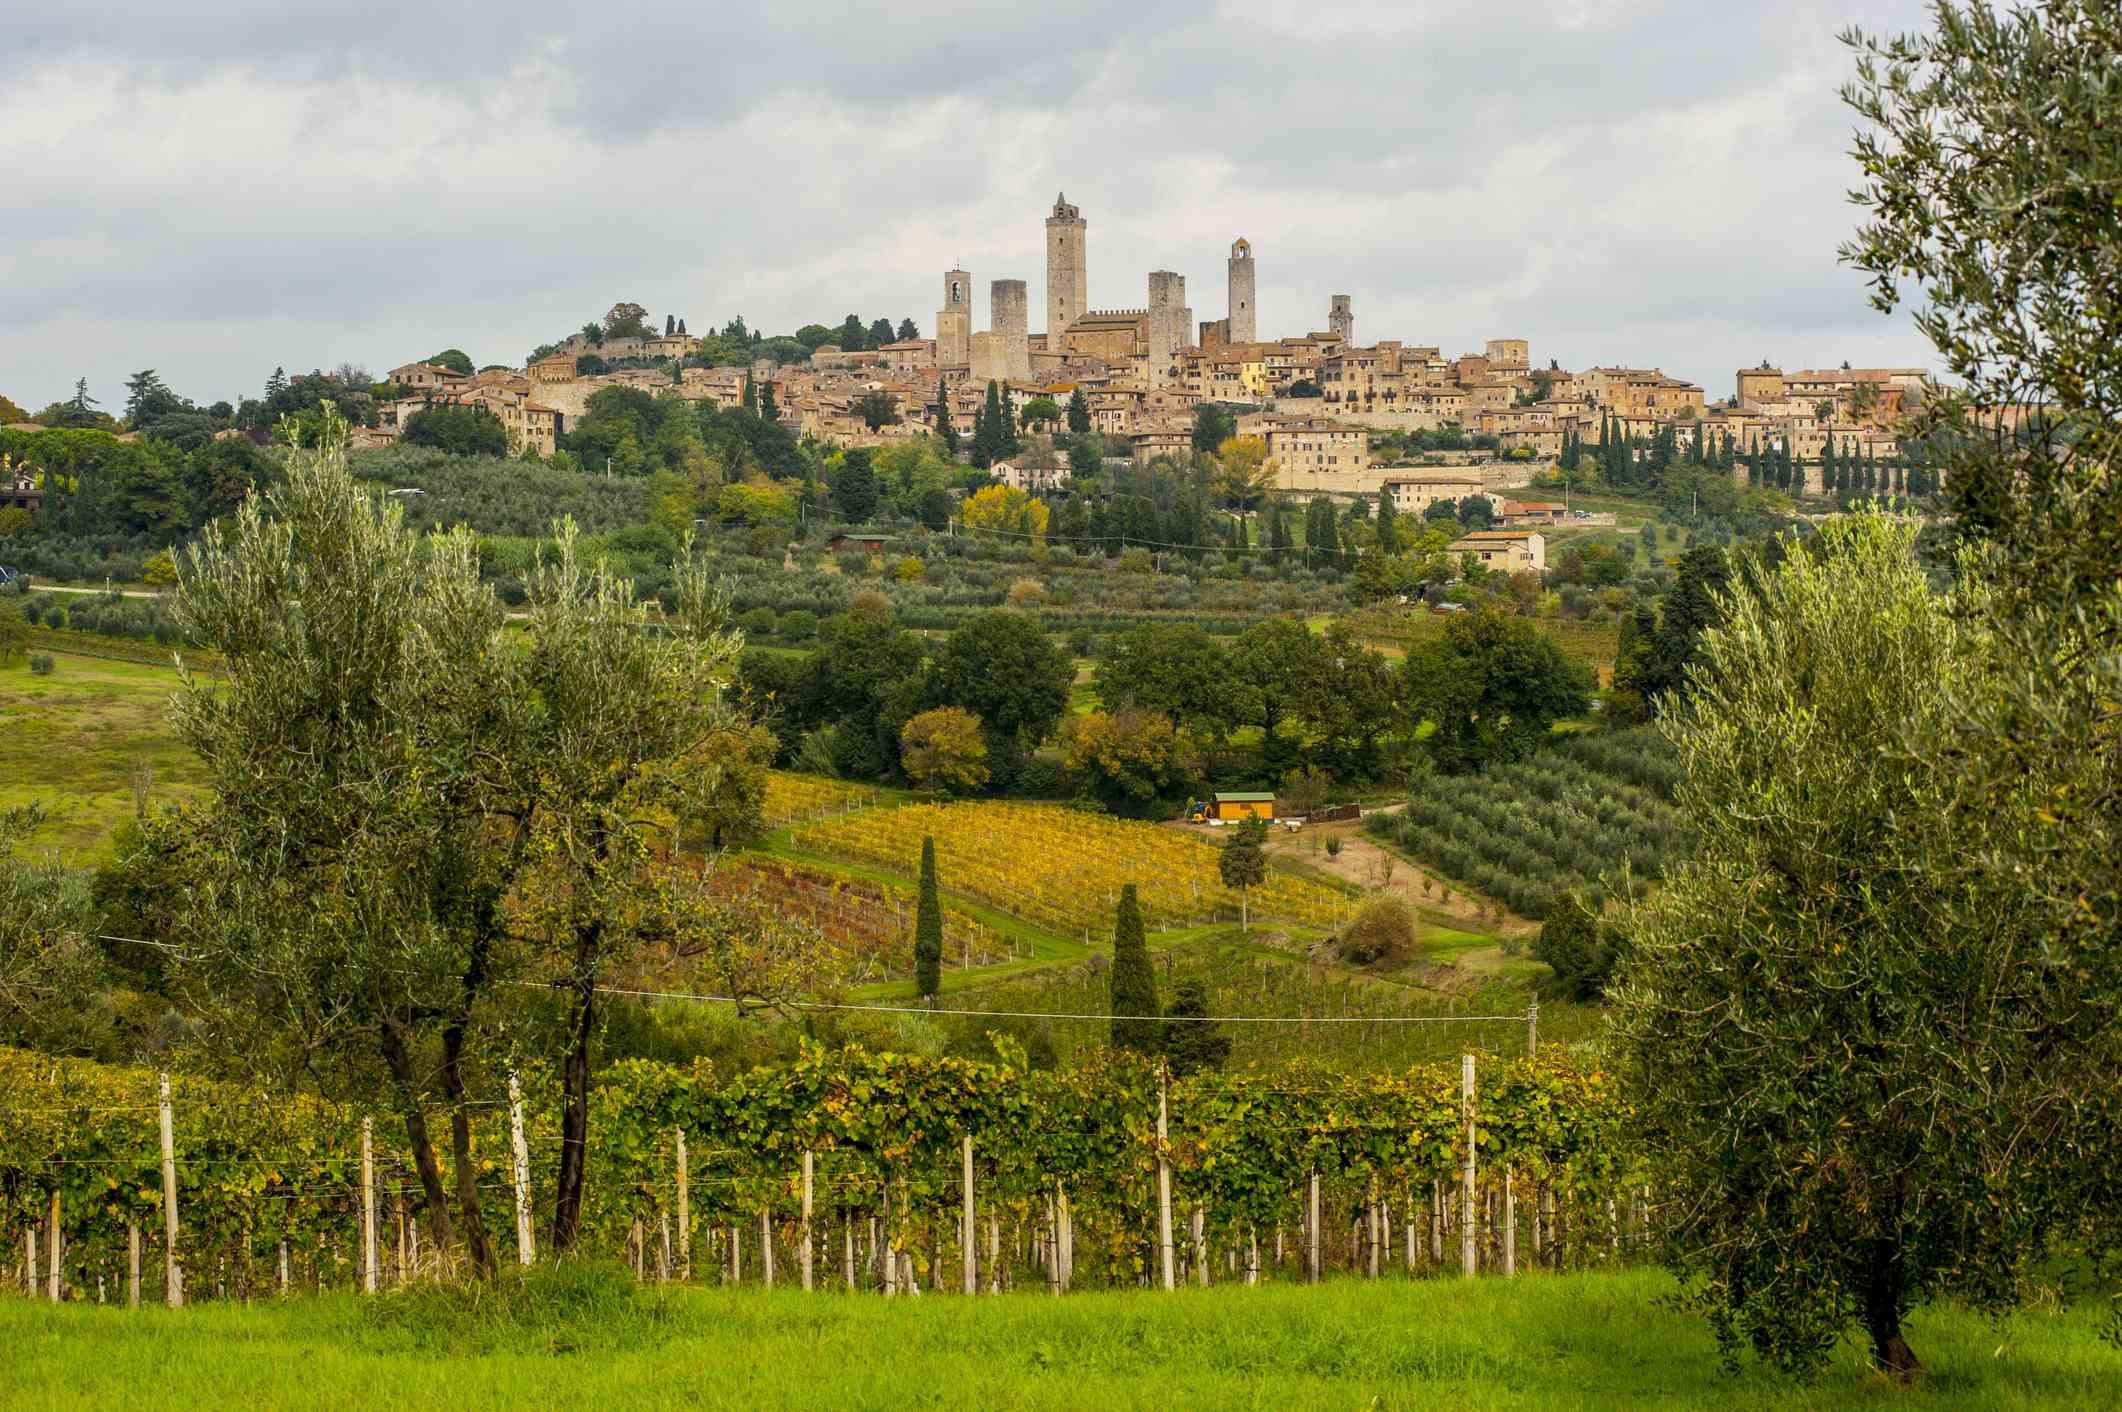 On the Via Francigena pilgrim route in Tuscany